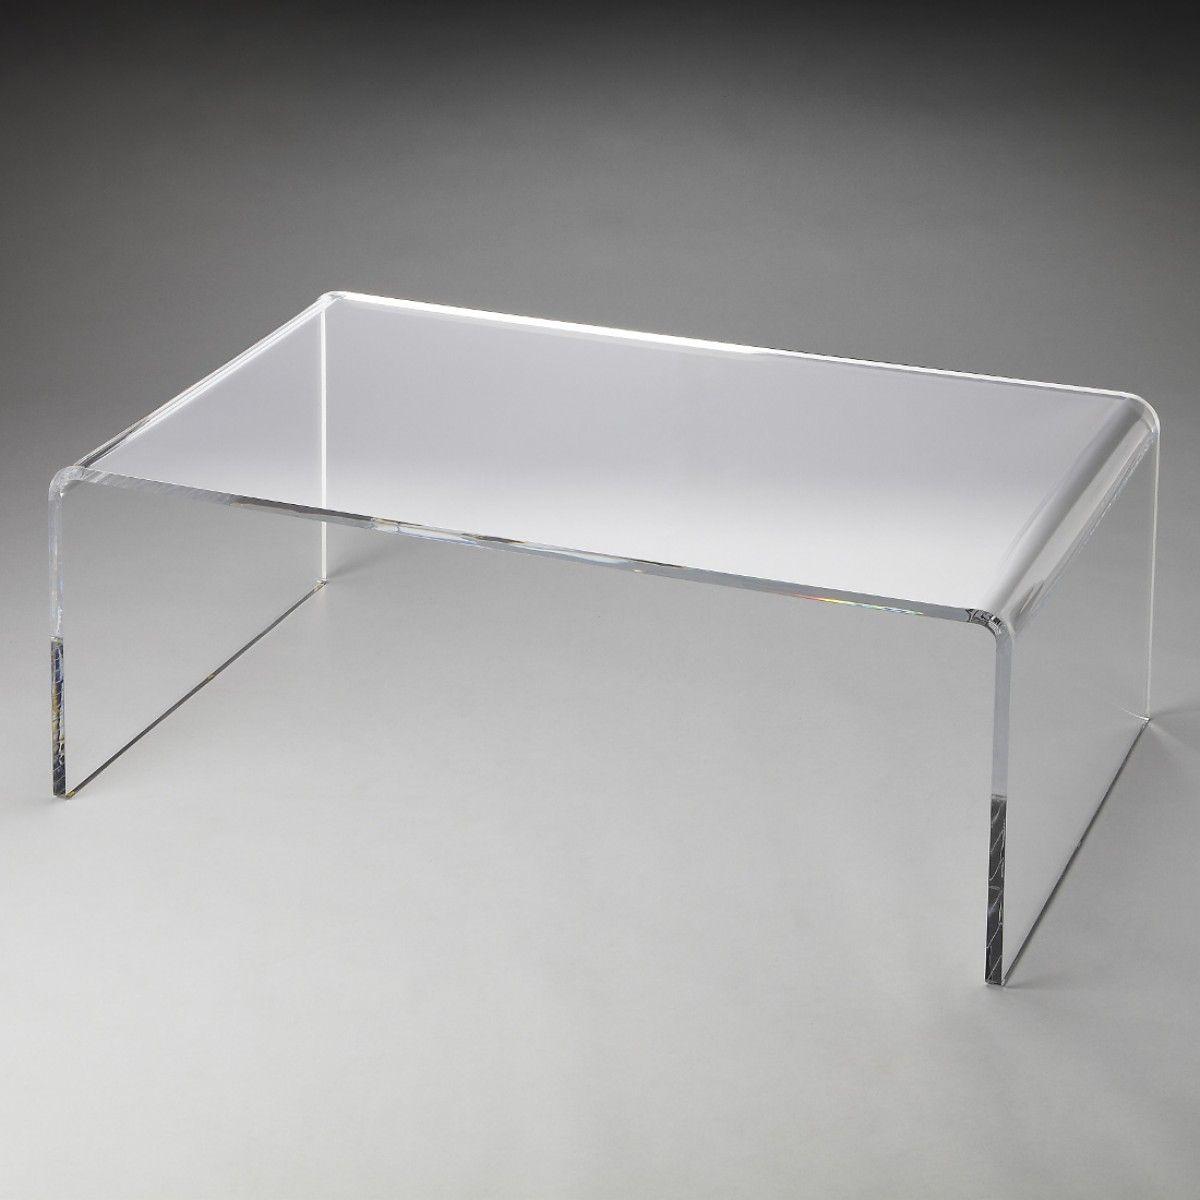 Butler Loft Crystal Clear Acrylic Cocktail Table With